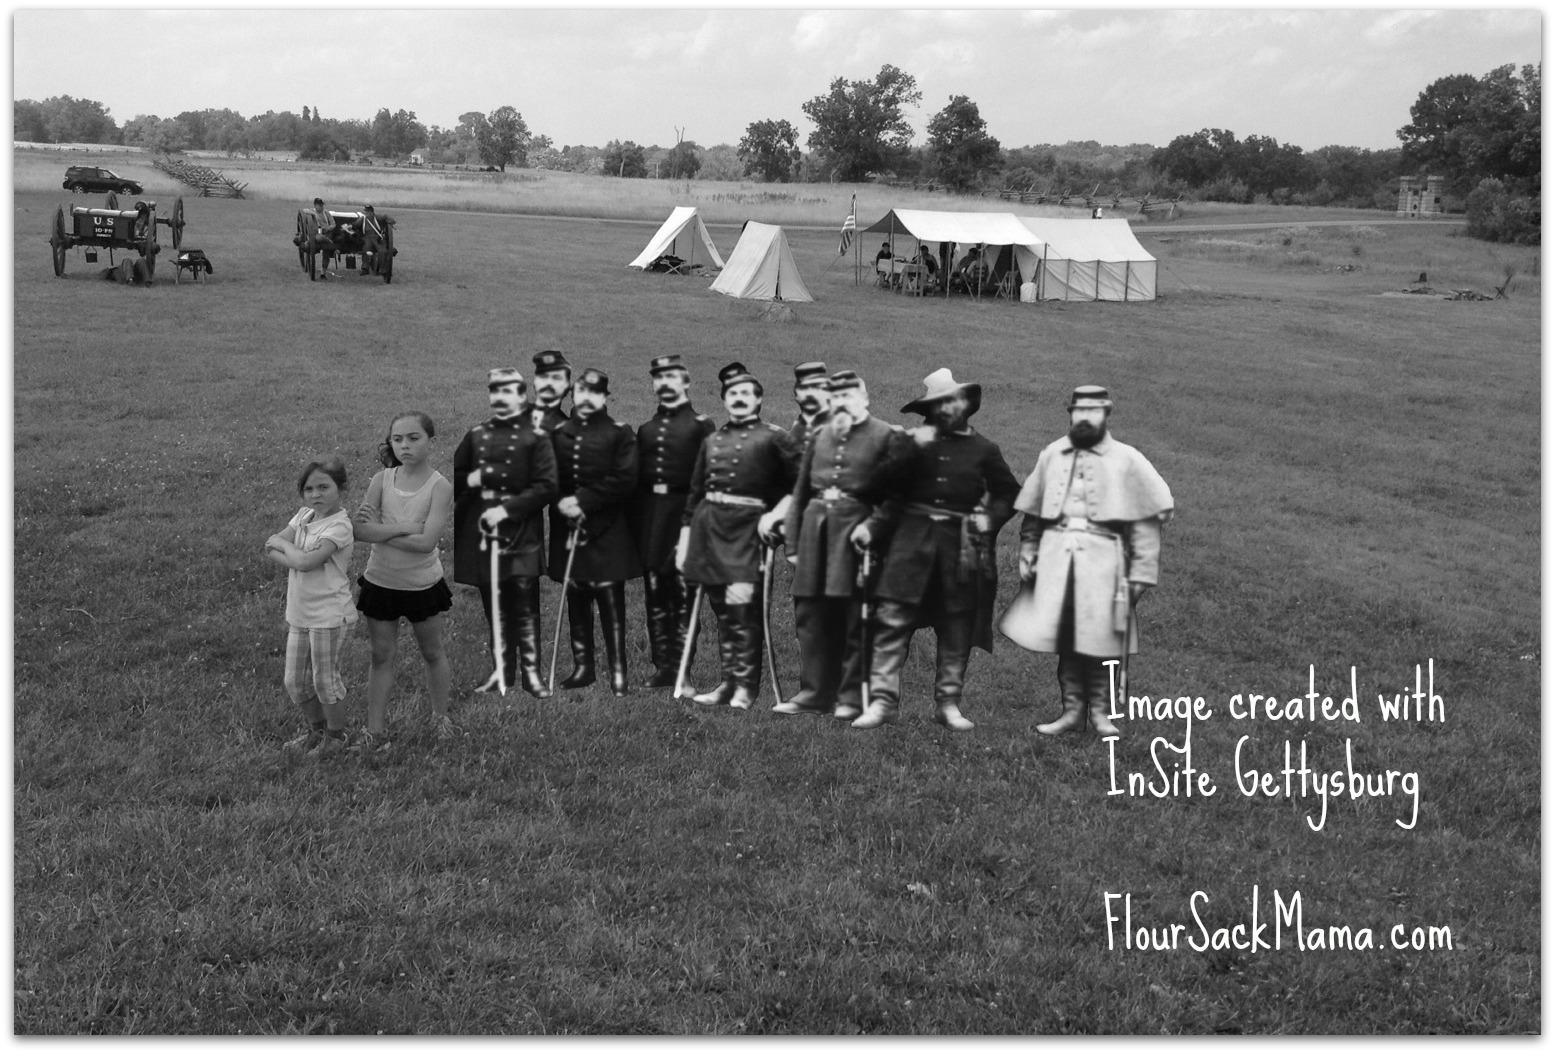 Gettysburg Creative Photo